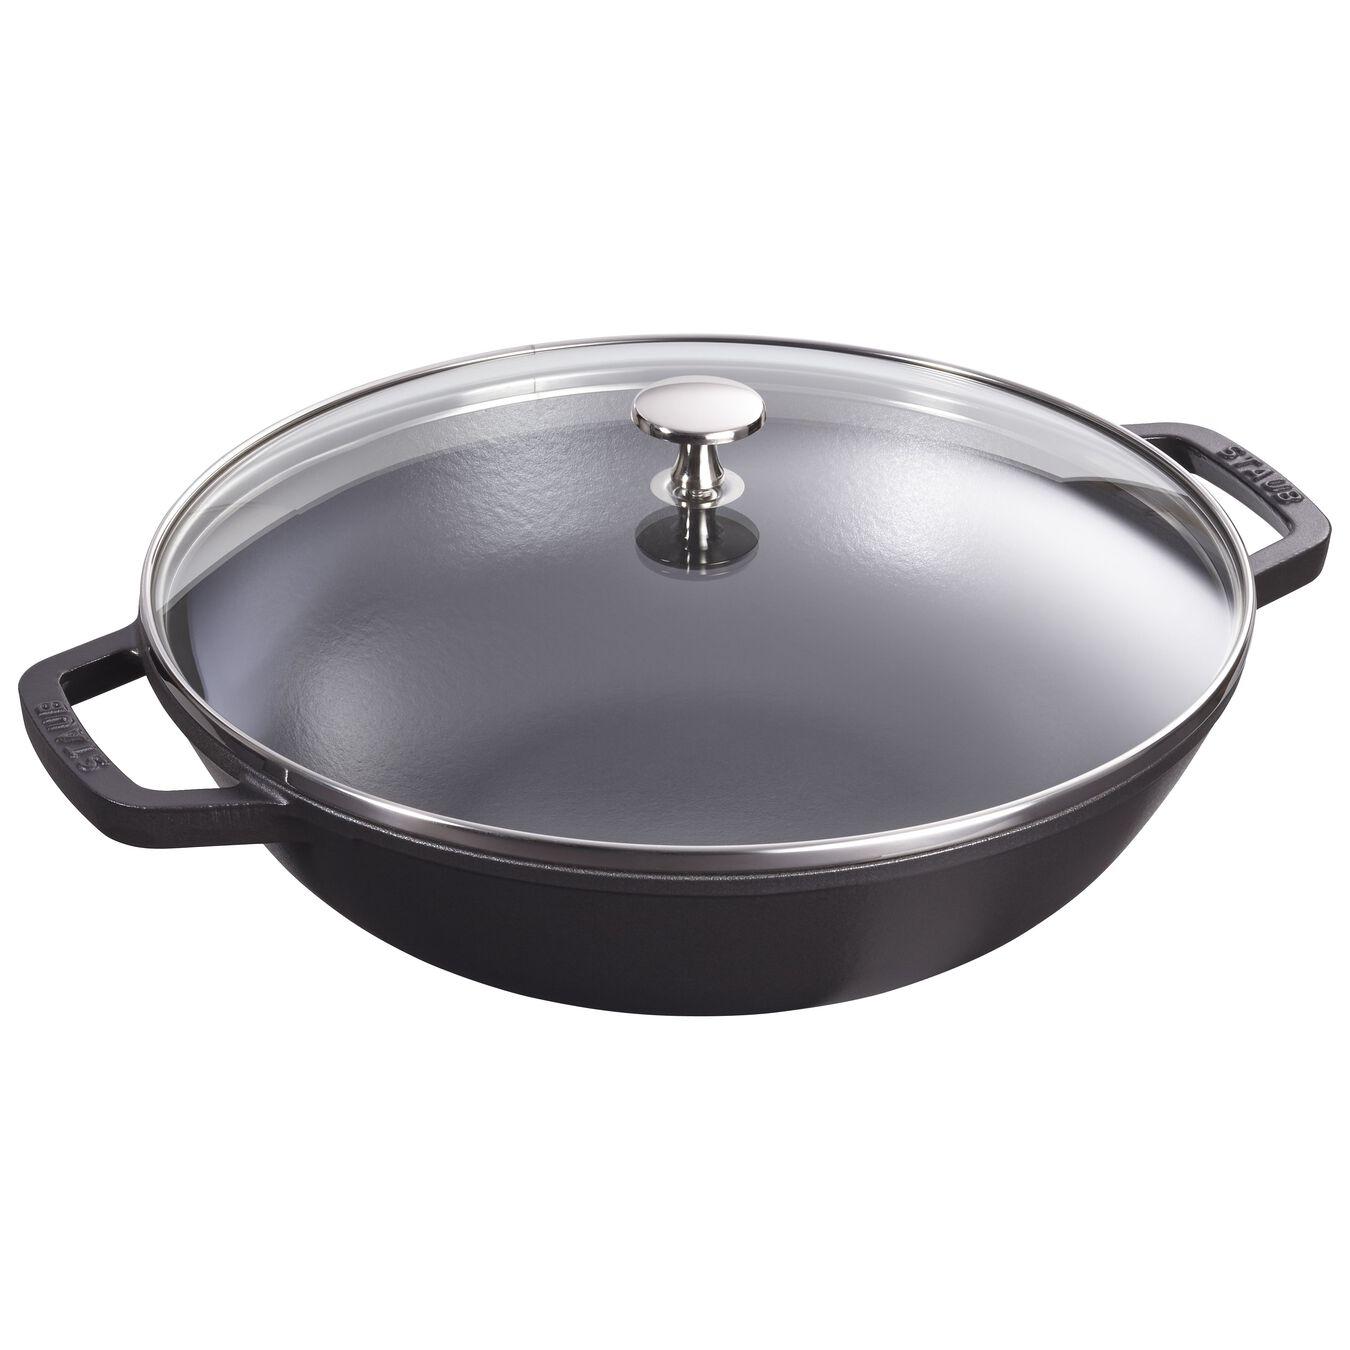 30 cm Cast iron Wok with glass lid, Black,,large 1